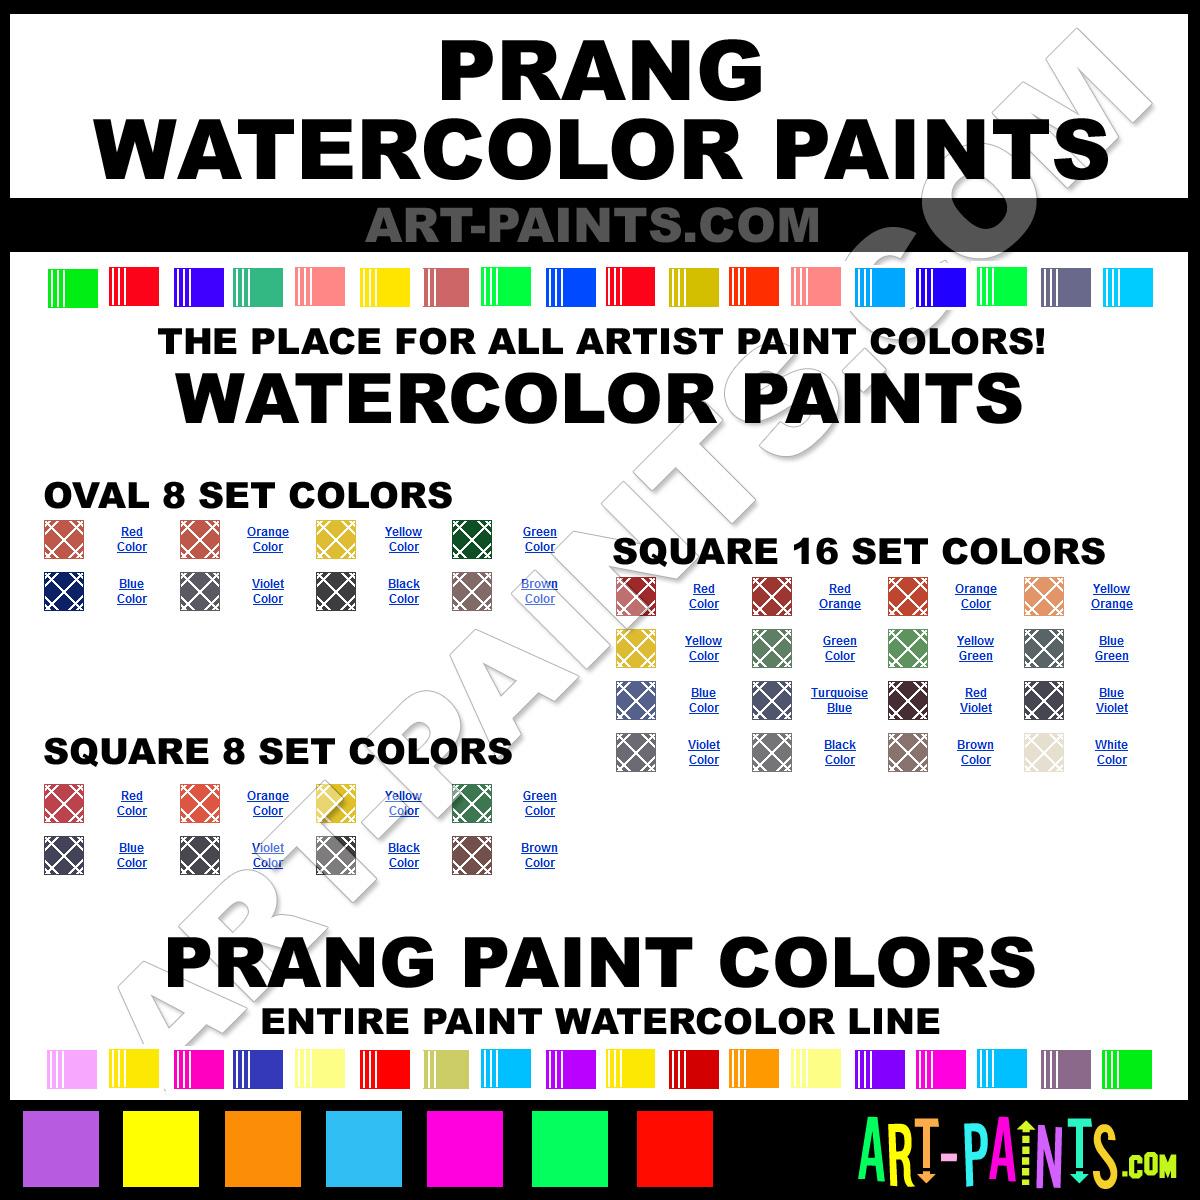 Paint Colors And Brands: Prang Watercolor Paint Brands